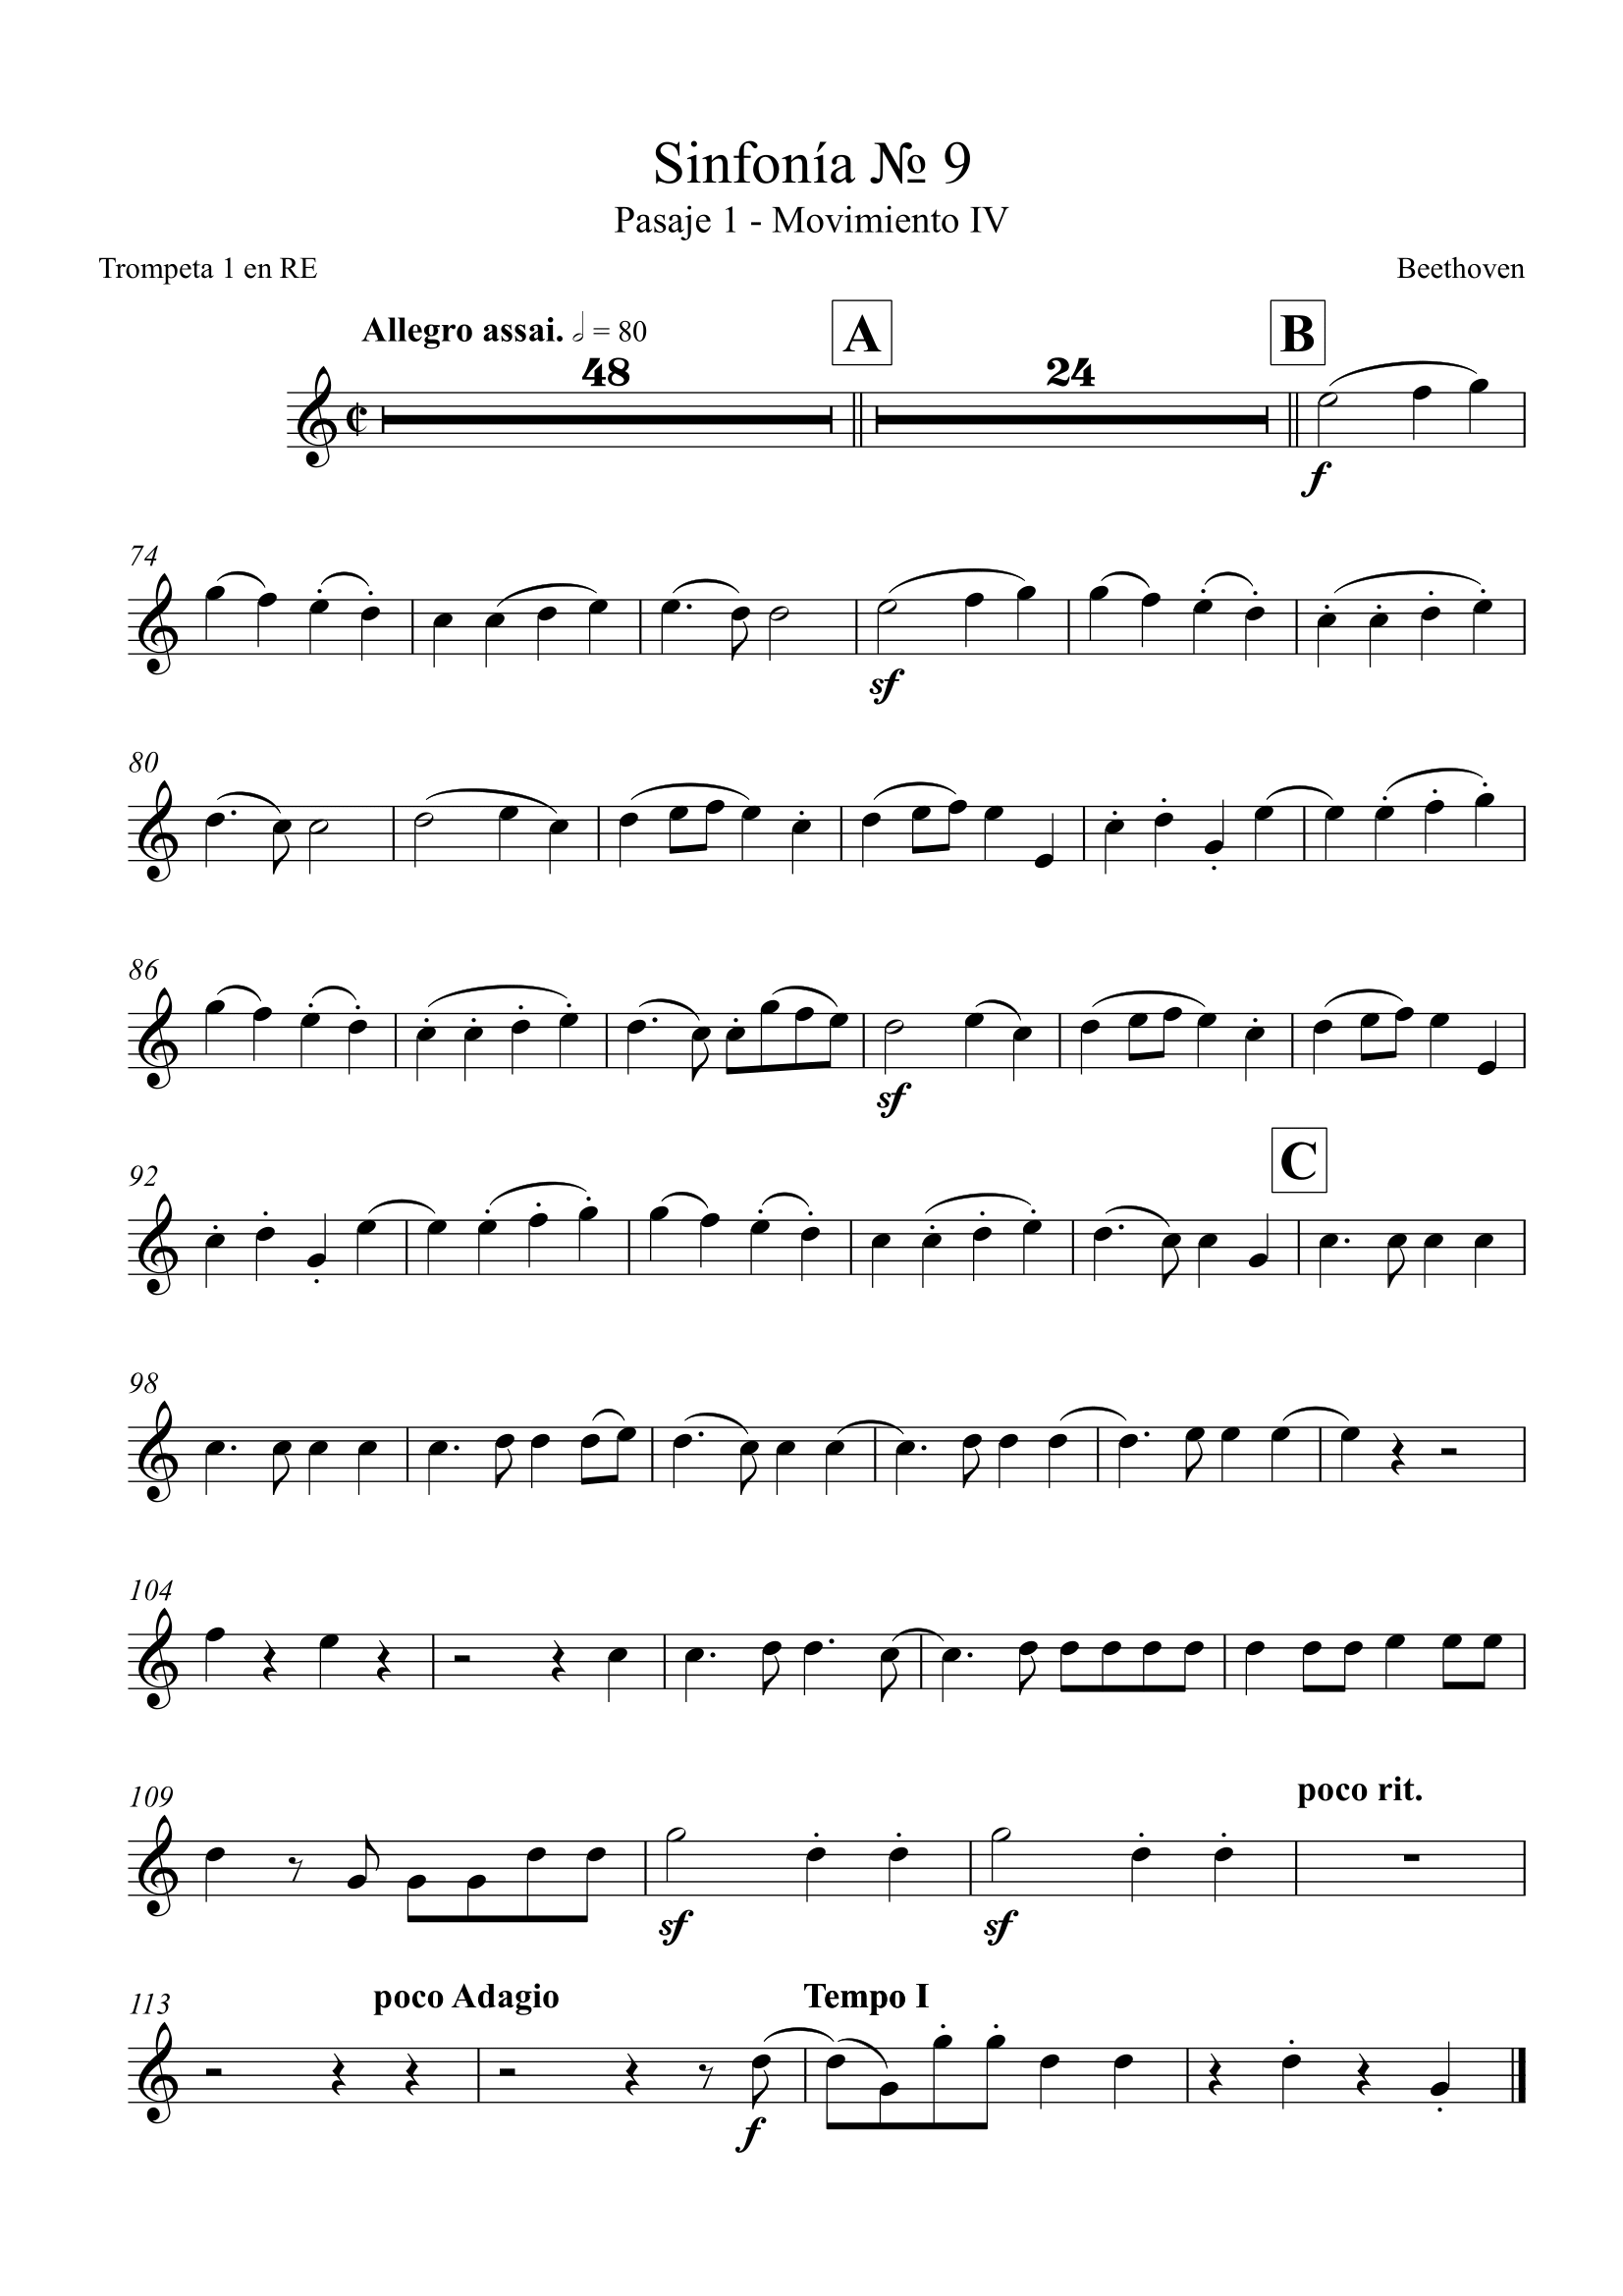 Beethoven-sinfonia-9-trompeta